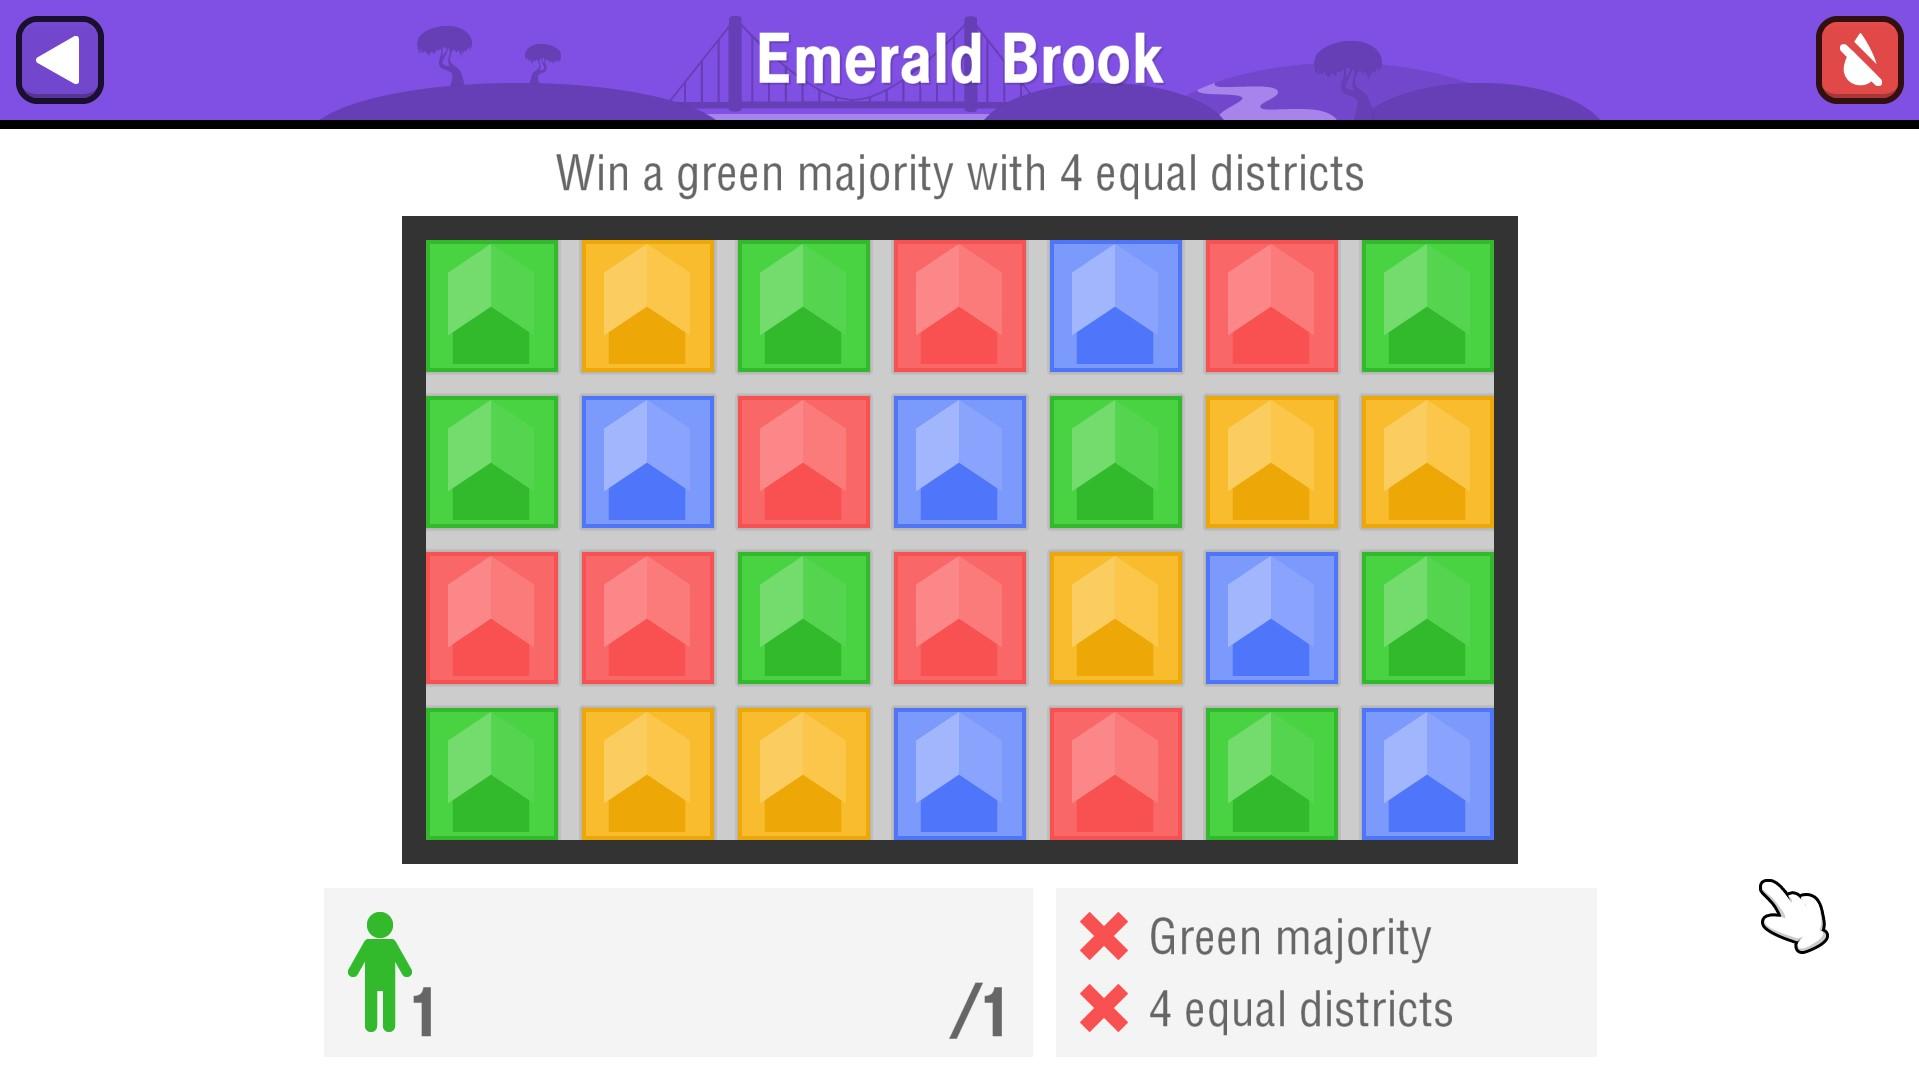 Emerald Brook